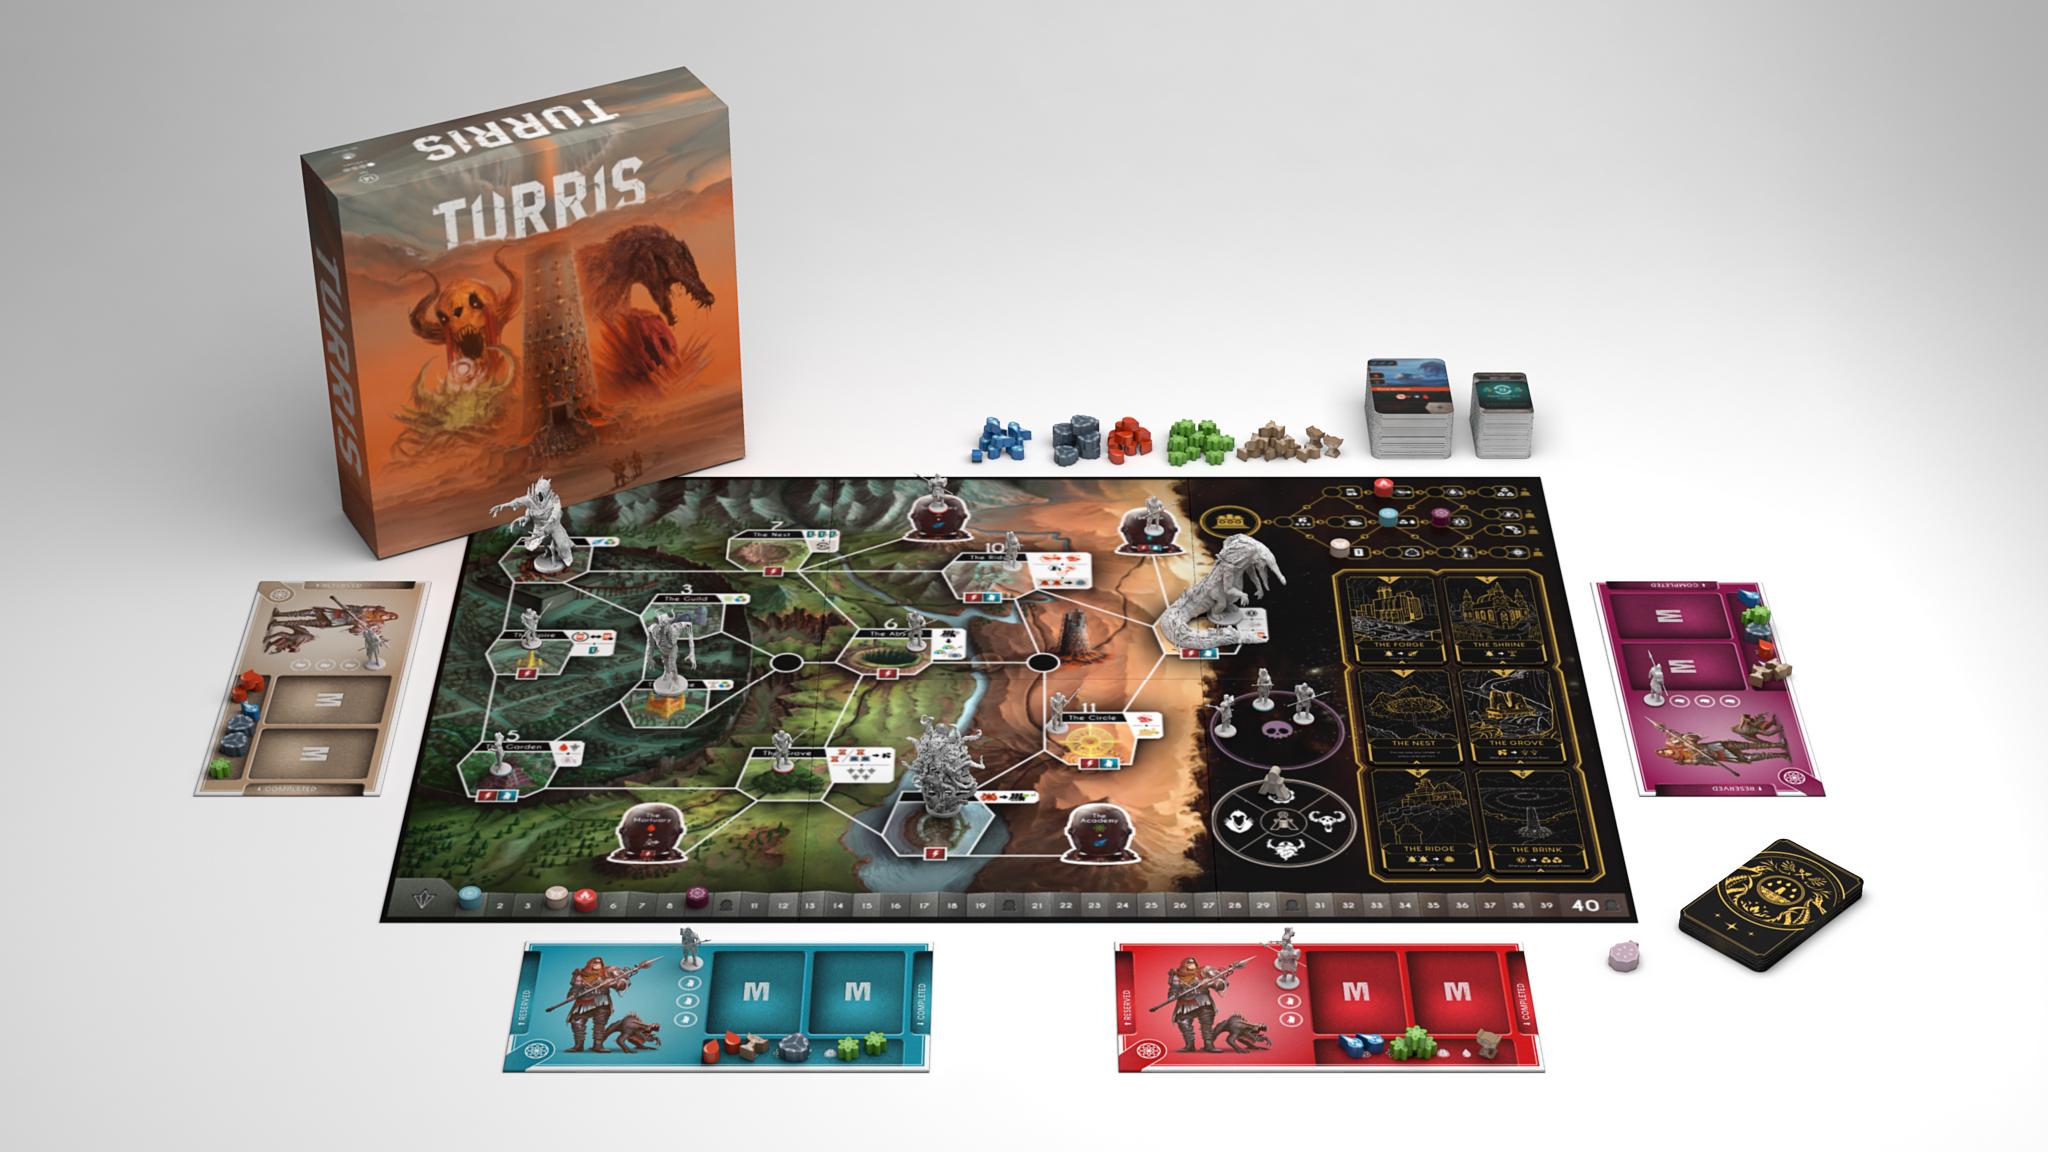 200129_Turris_Kickstarter_Overview_c03